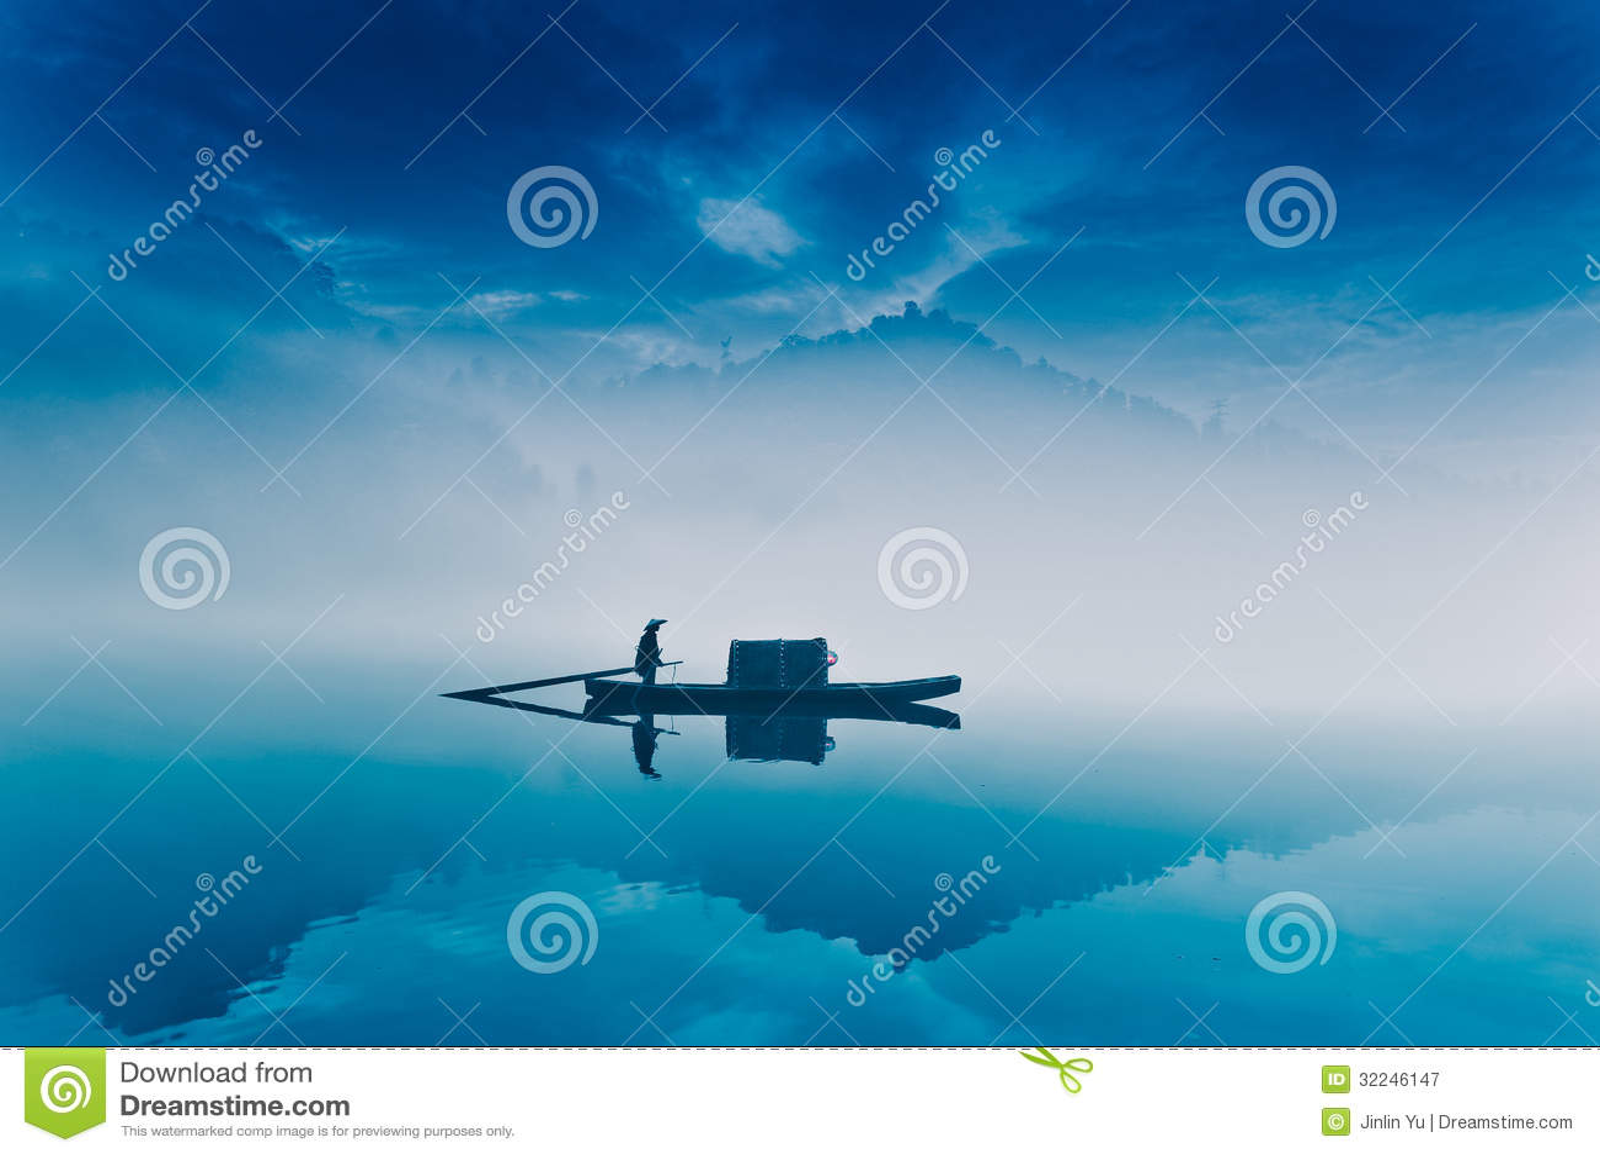 Fishing-boat in fairyland